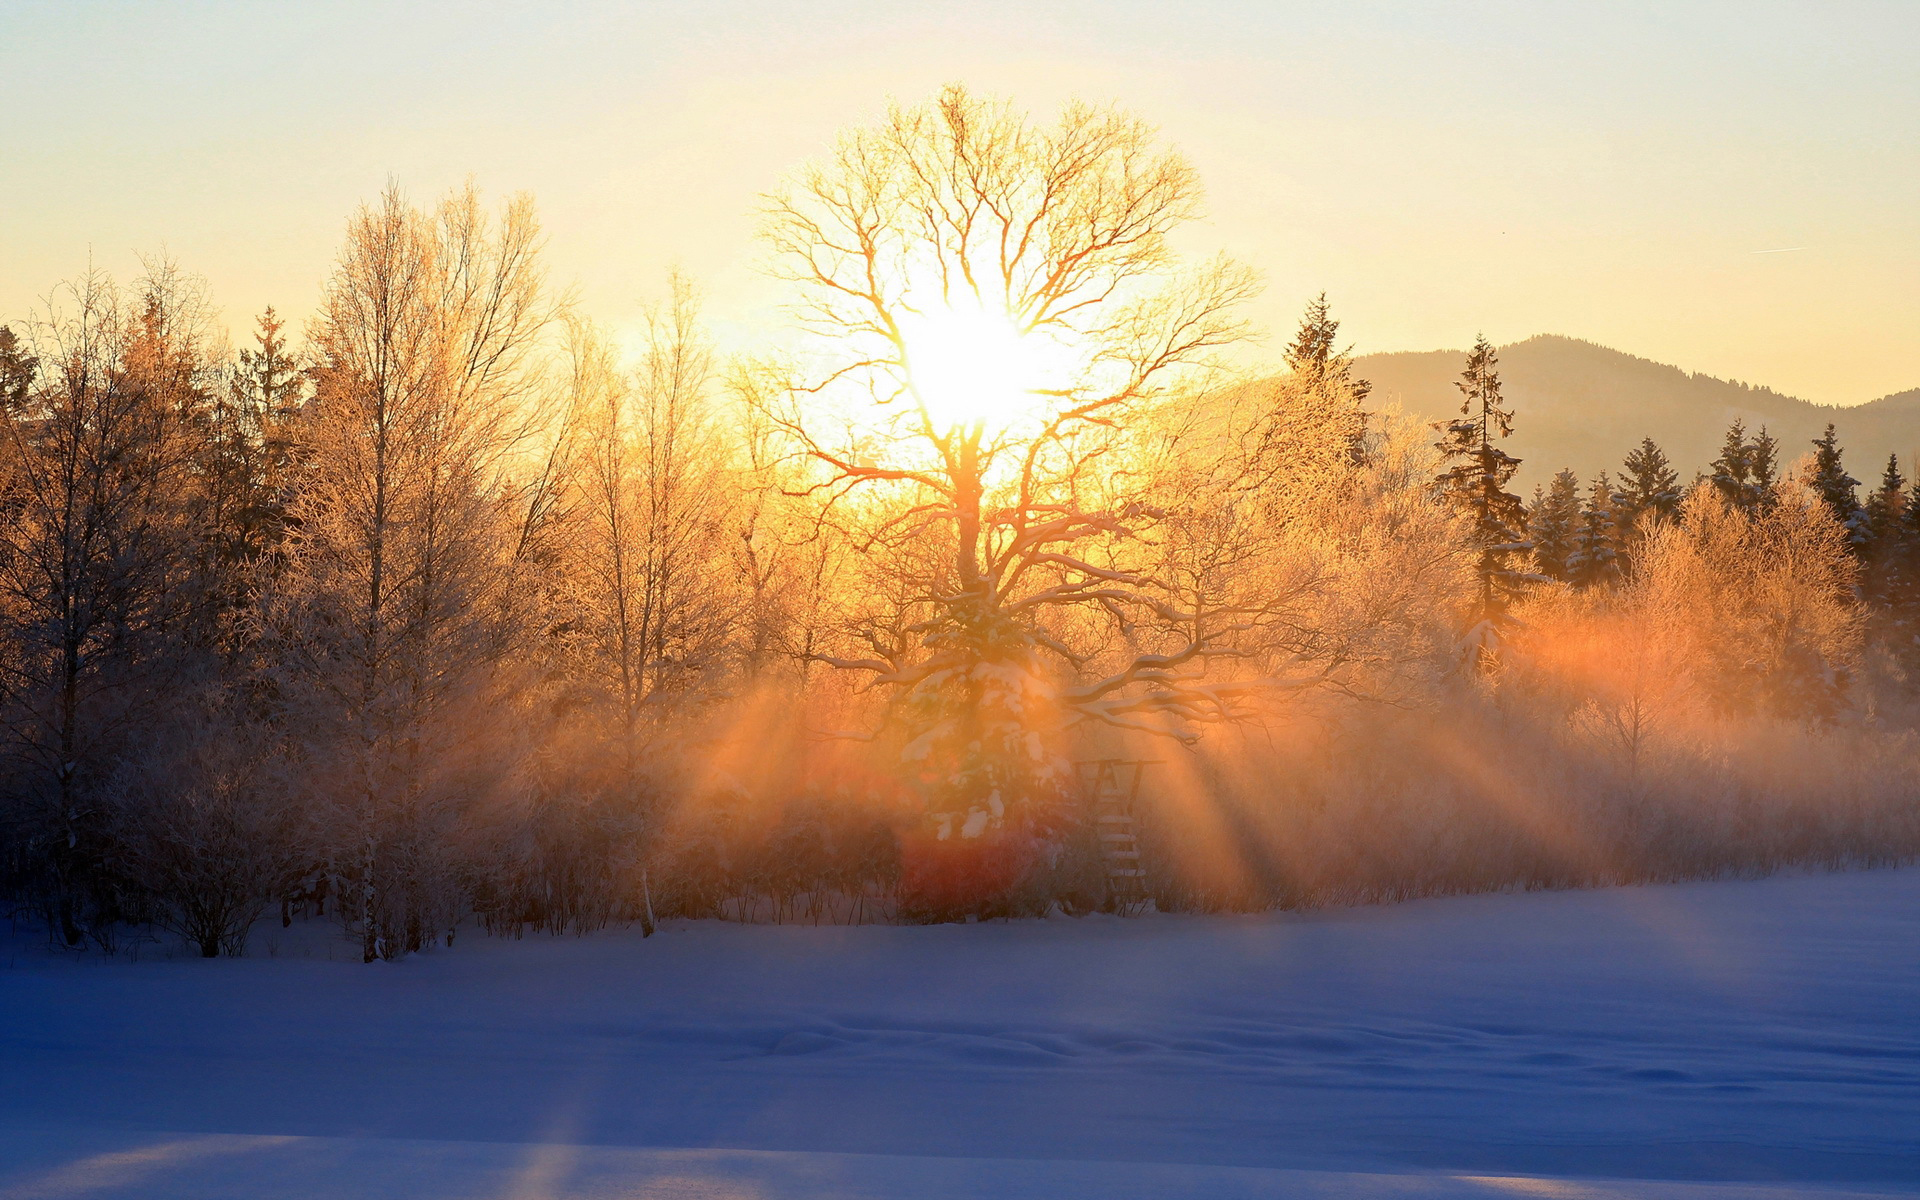 Снег, лучи, солнце, лес, ели бесплатно